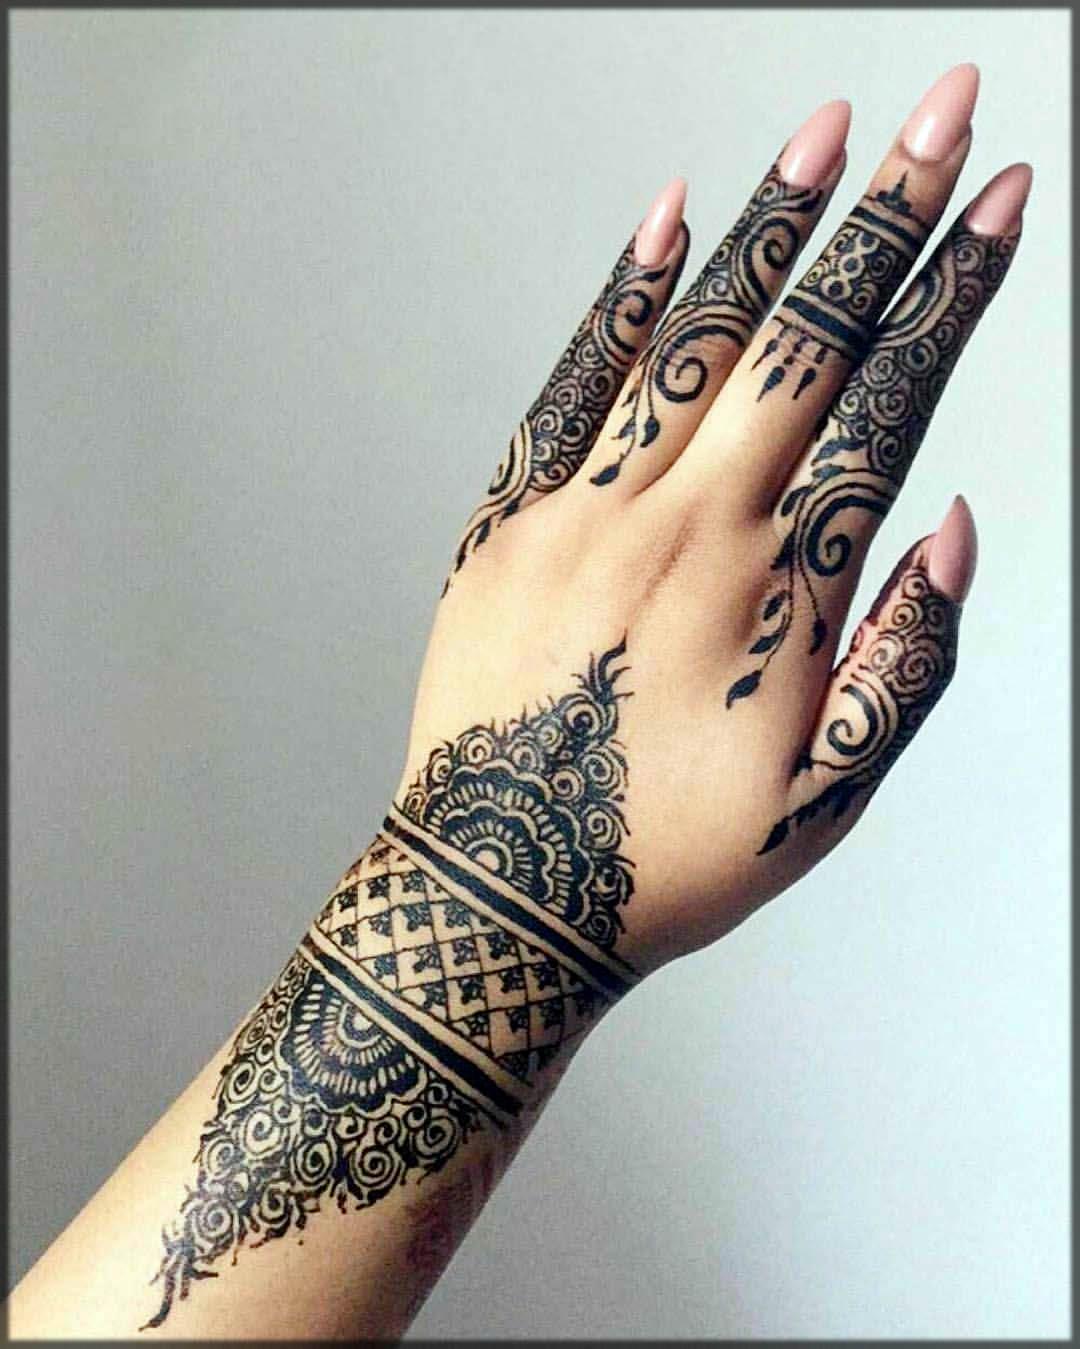 new styles of henna